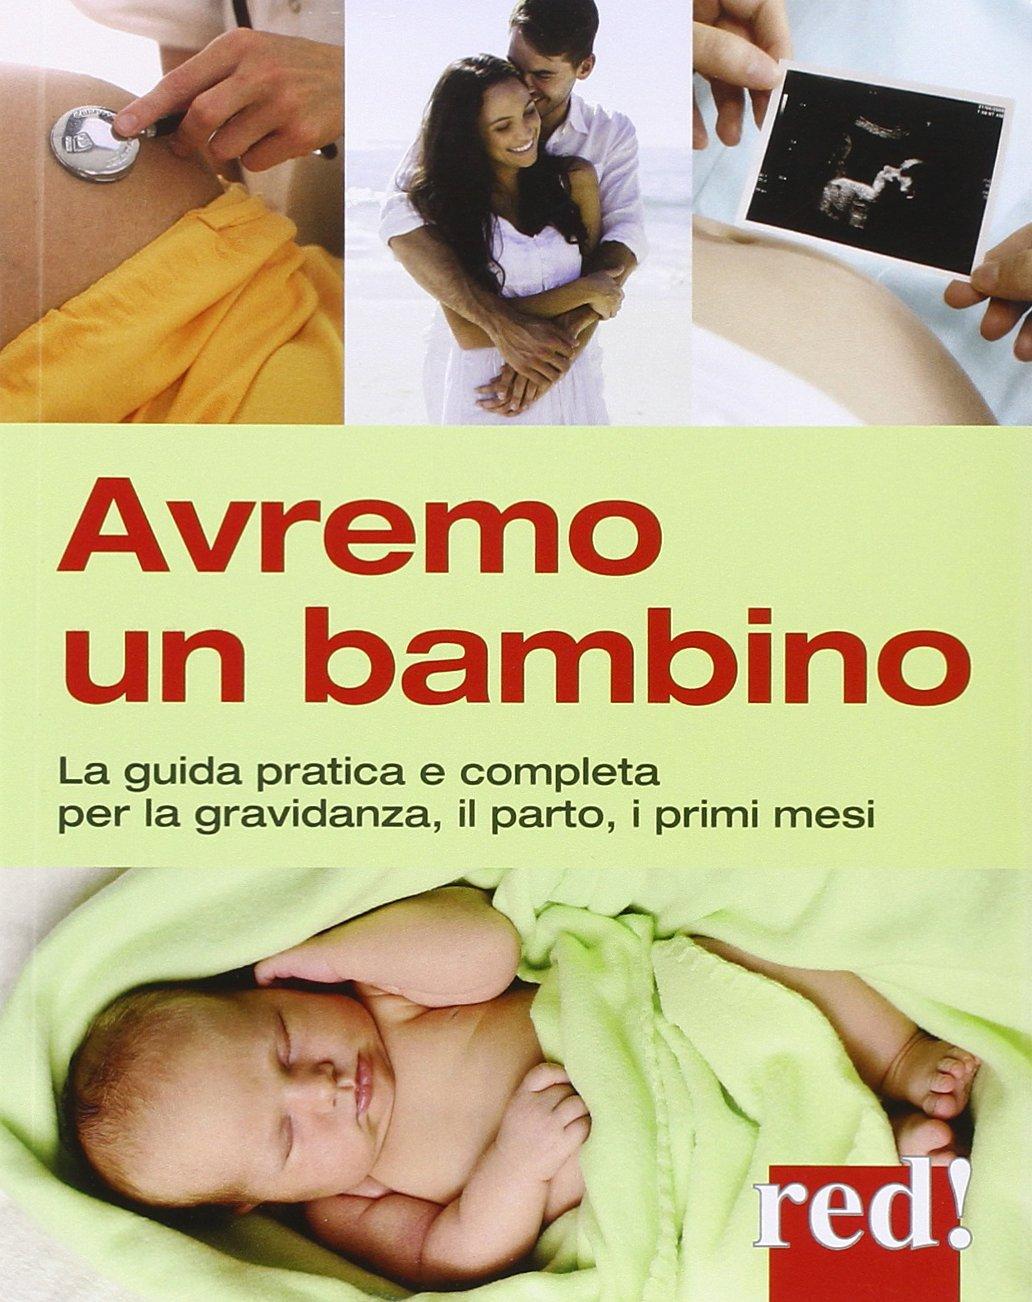 AVREMO UN BAMBINO EBOOK